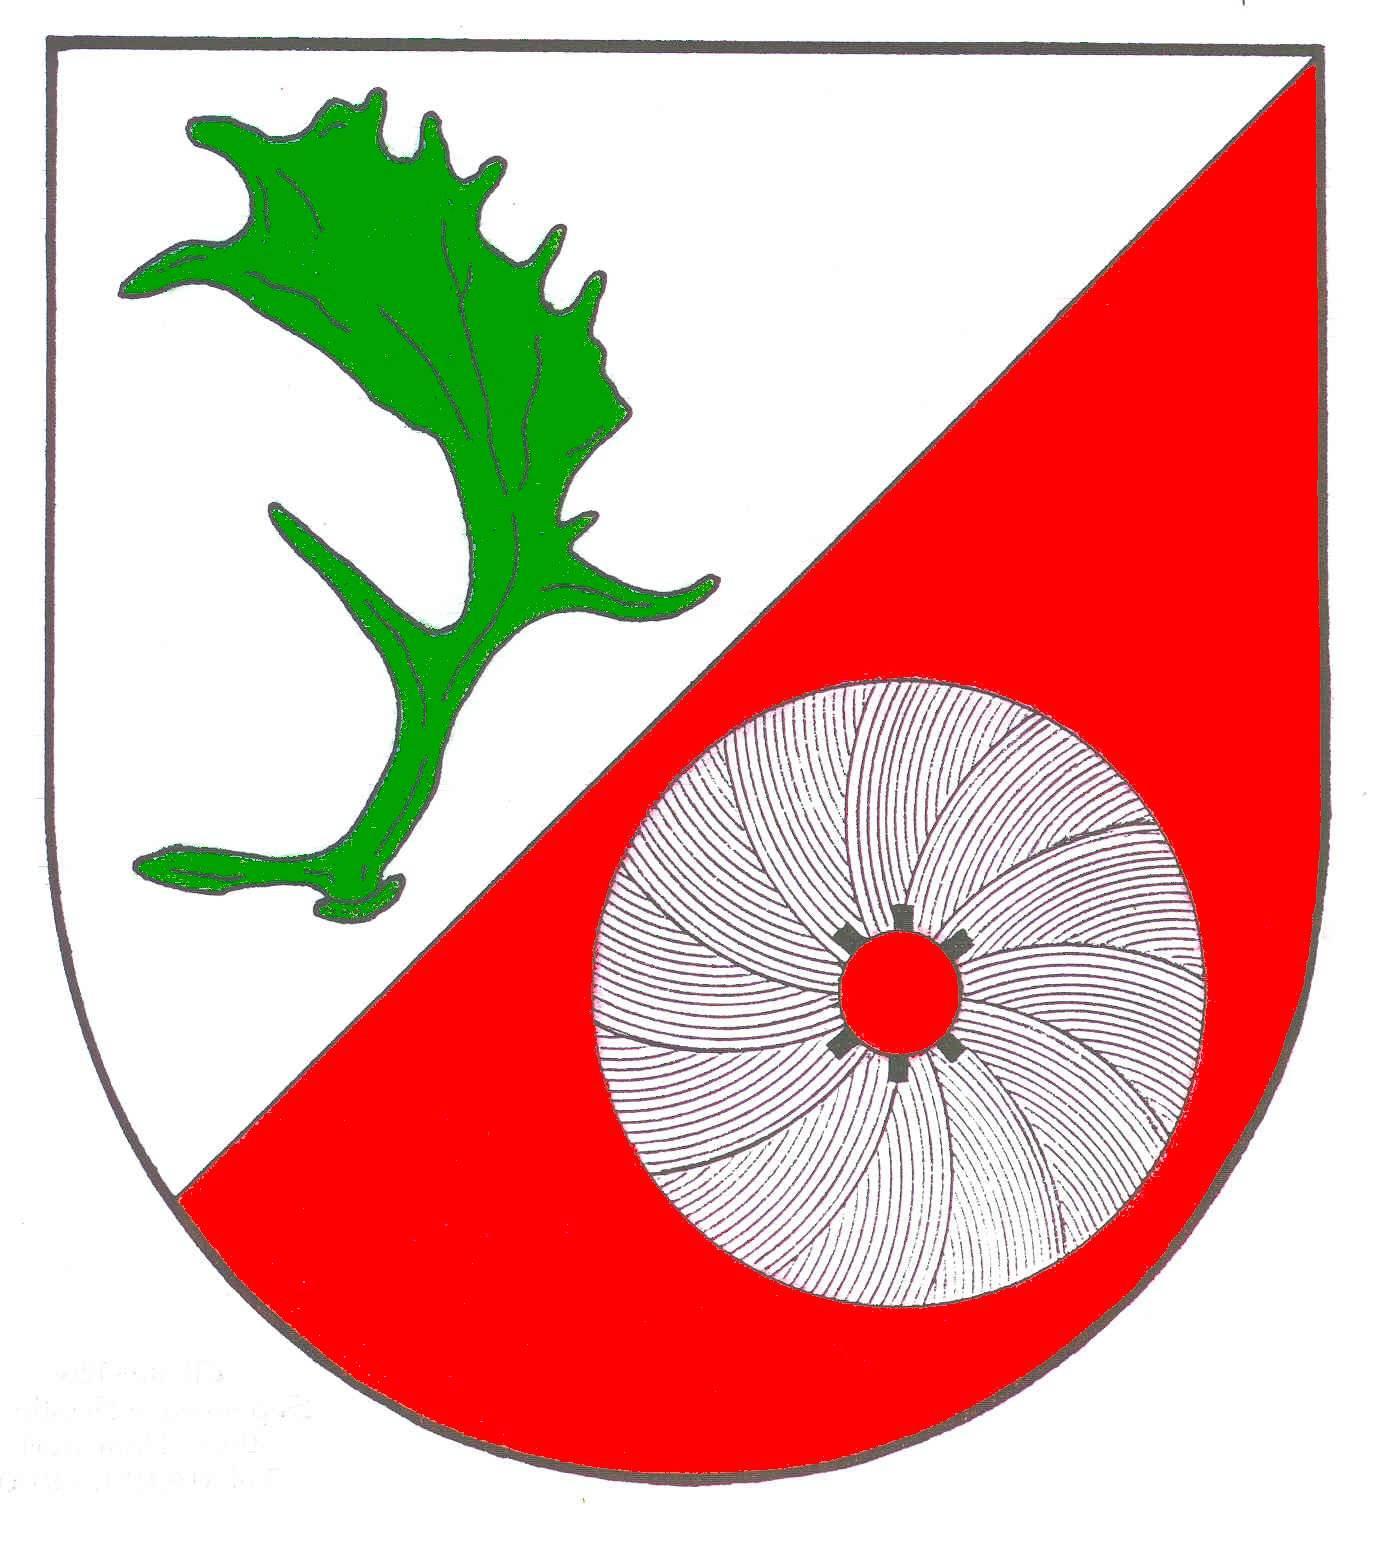 Wappen GemeindeDamsdorf, Kreis Segeberg